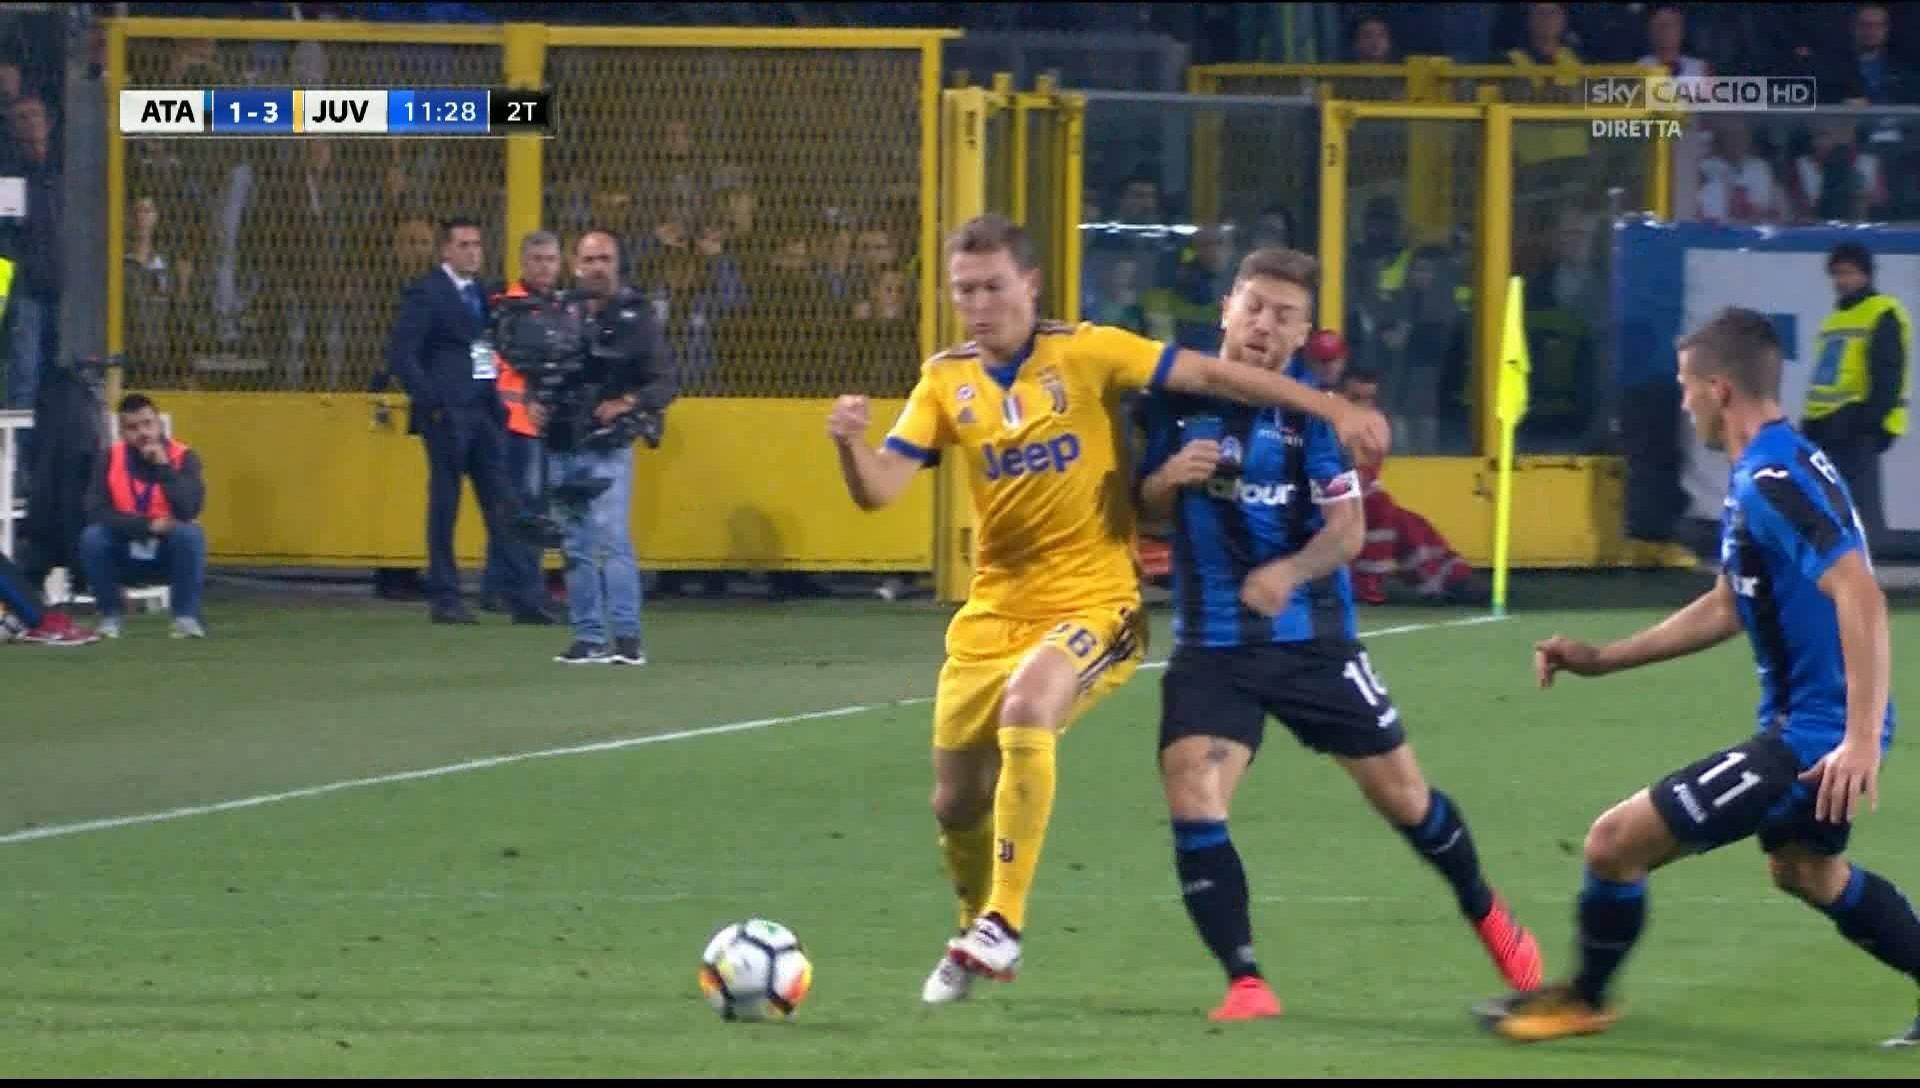 Atalanta-Juventus, gomitata di Lichtsteiner a Gomez: la fotosequenza